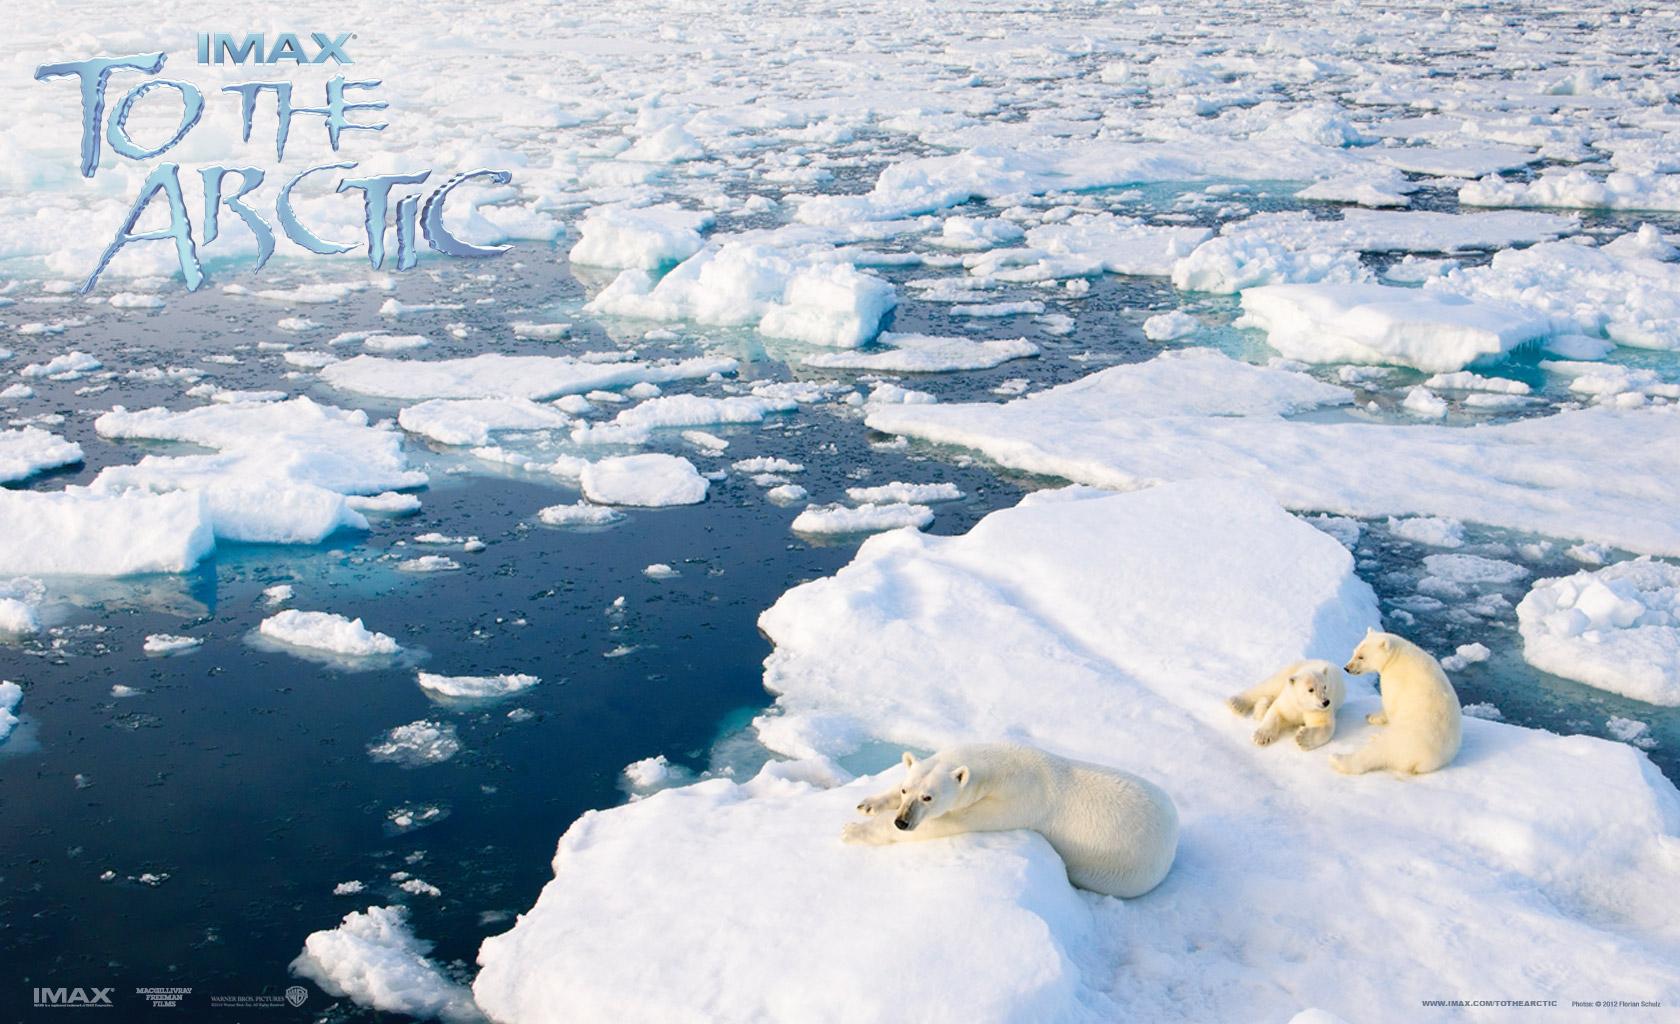 wallpaper arctic wallpapers 2 - photo #2